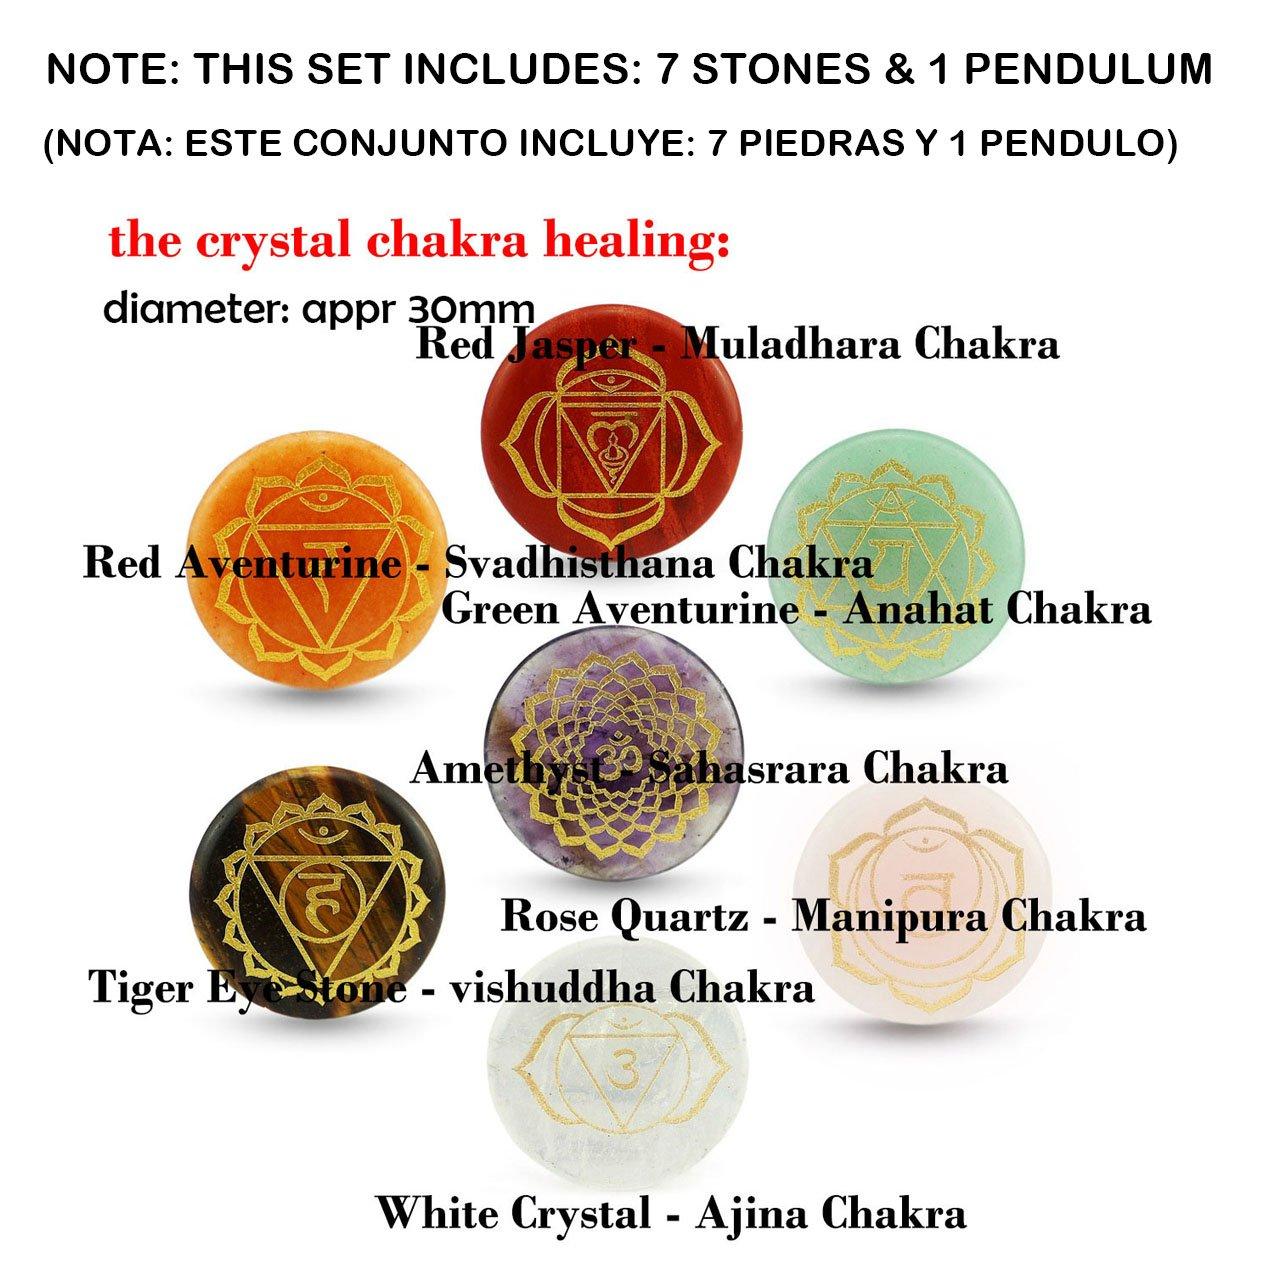 /7/Chakra gestapelt Layered Kristall Dowsing Wahrsagung Pendel /& 7/Gravur Chakren Holistic healthstone Oval Crystal Achat Kit mikini Heilung Schmuck Set/ #1